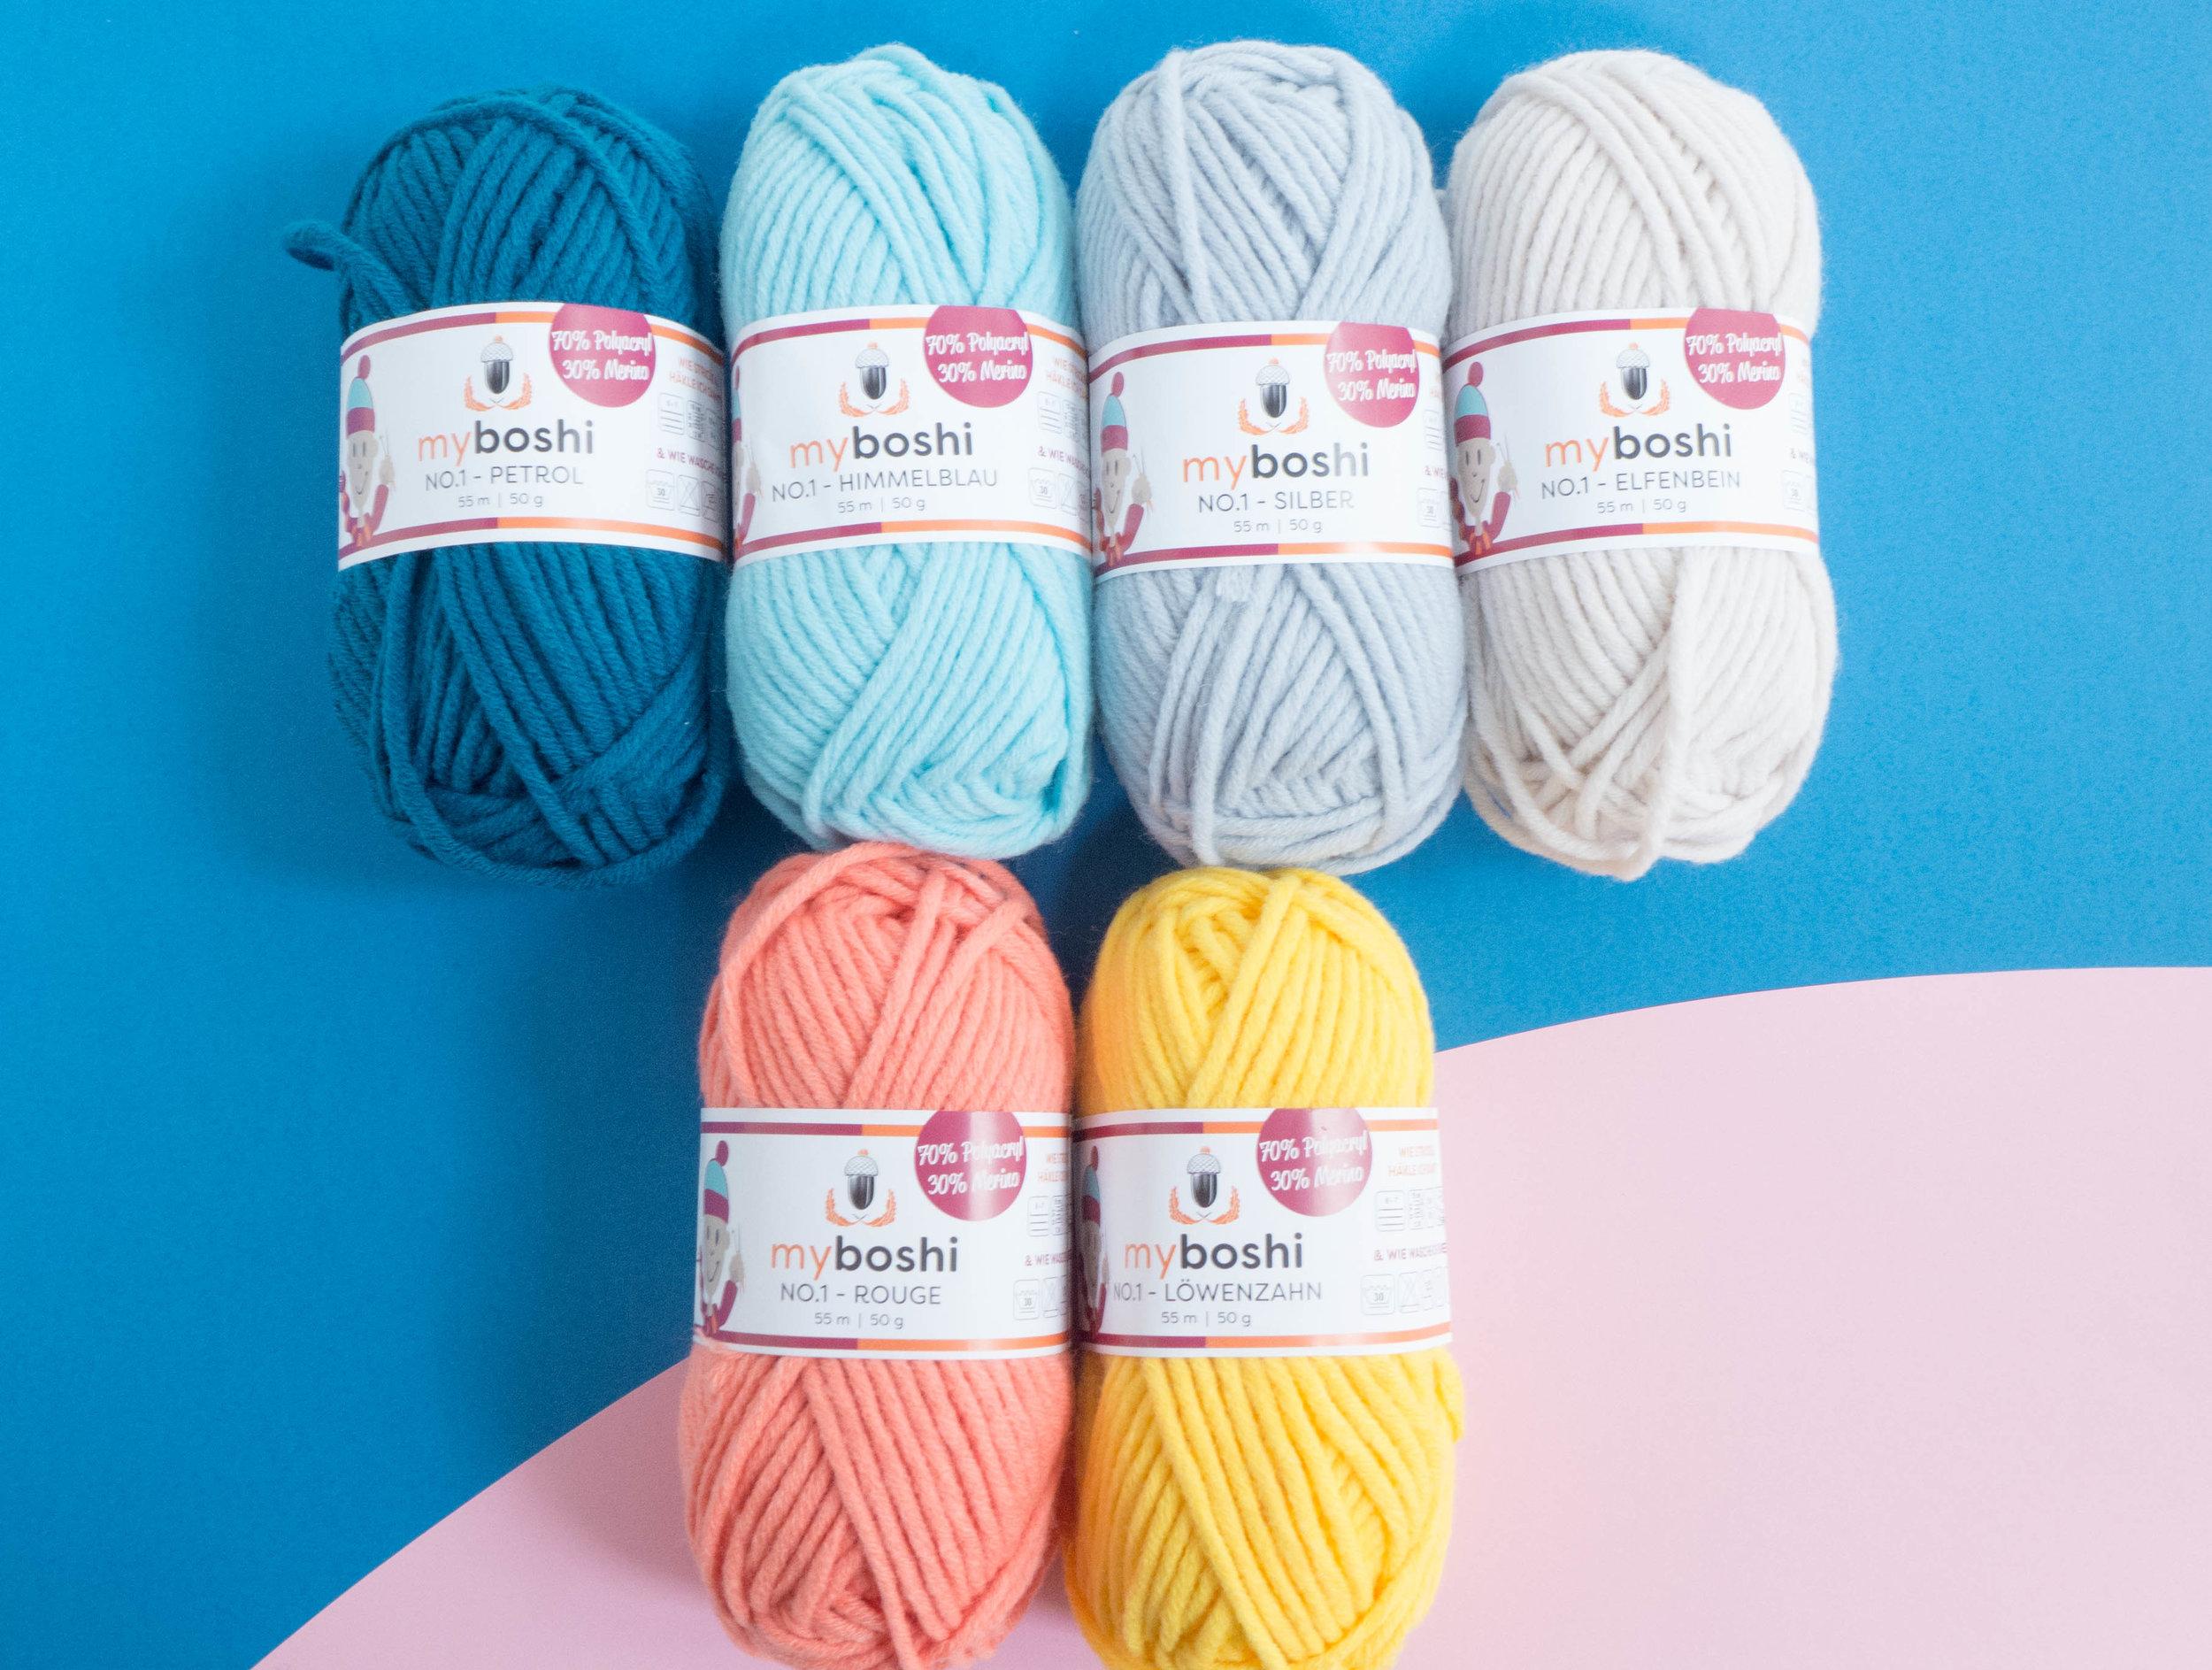 myboshi No 1 yarn available at   The Joyful Punch .